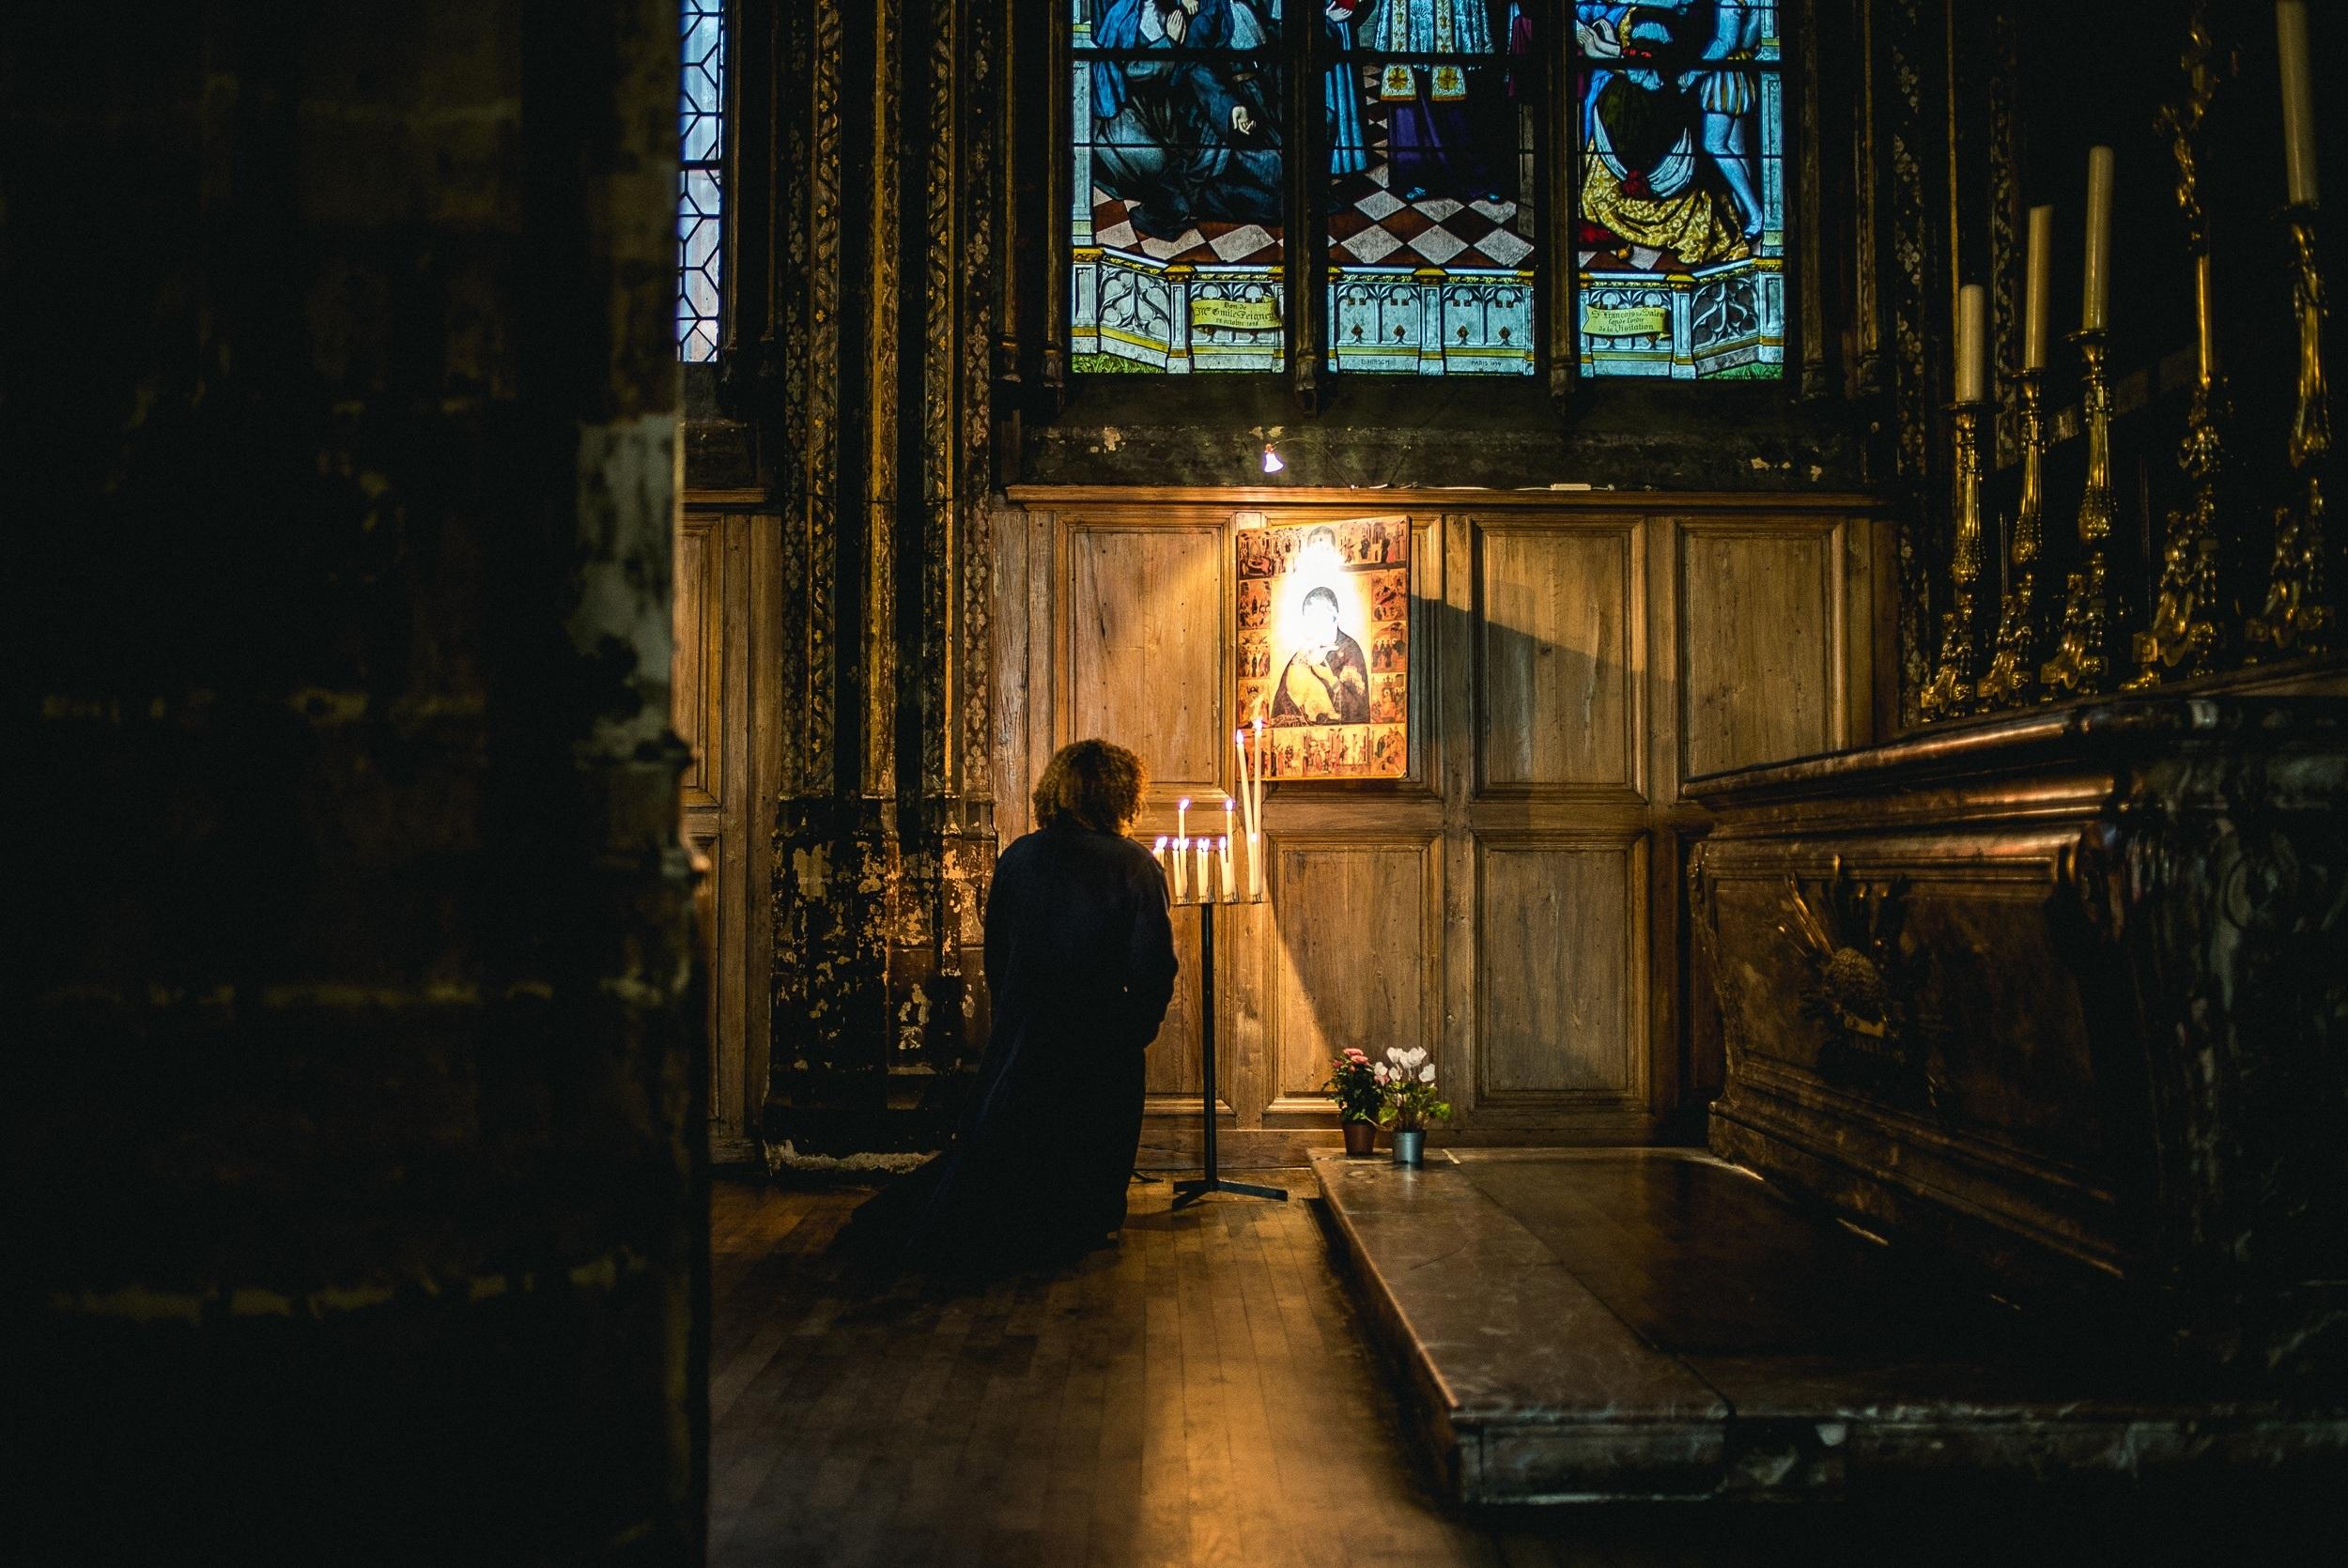 church offering prayers - HD2500×1670